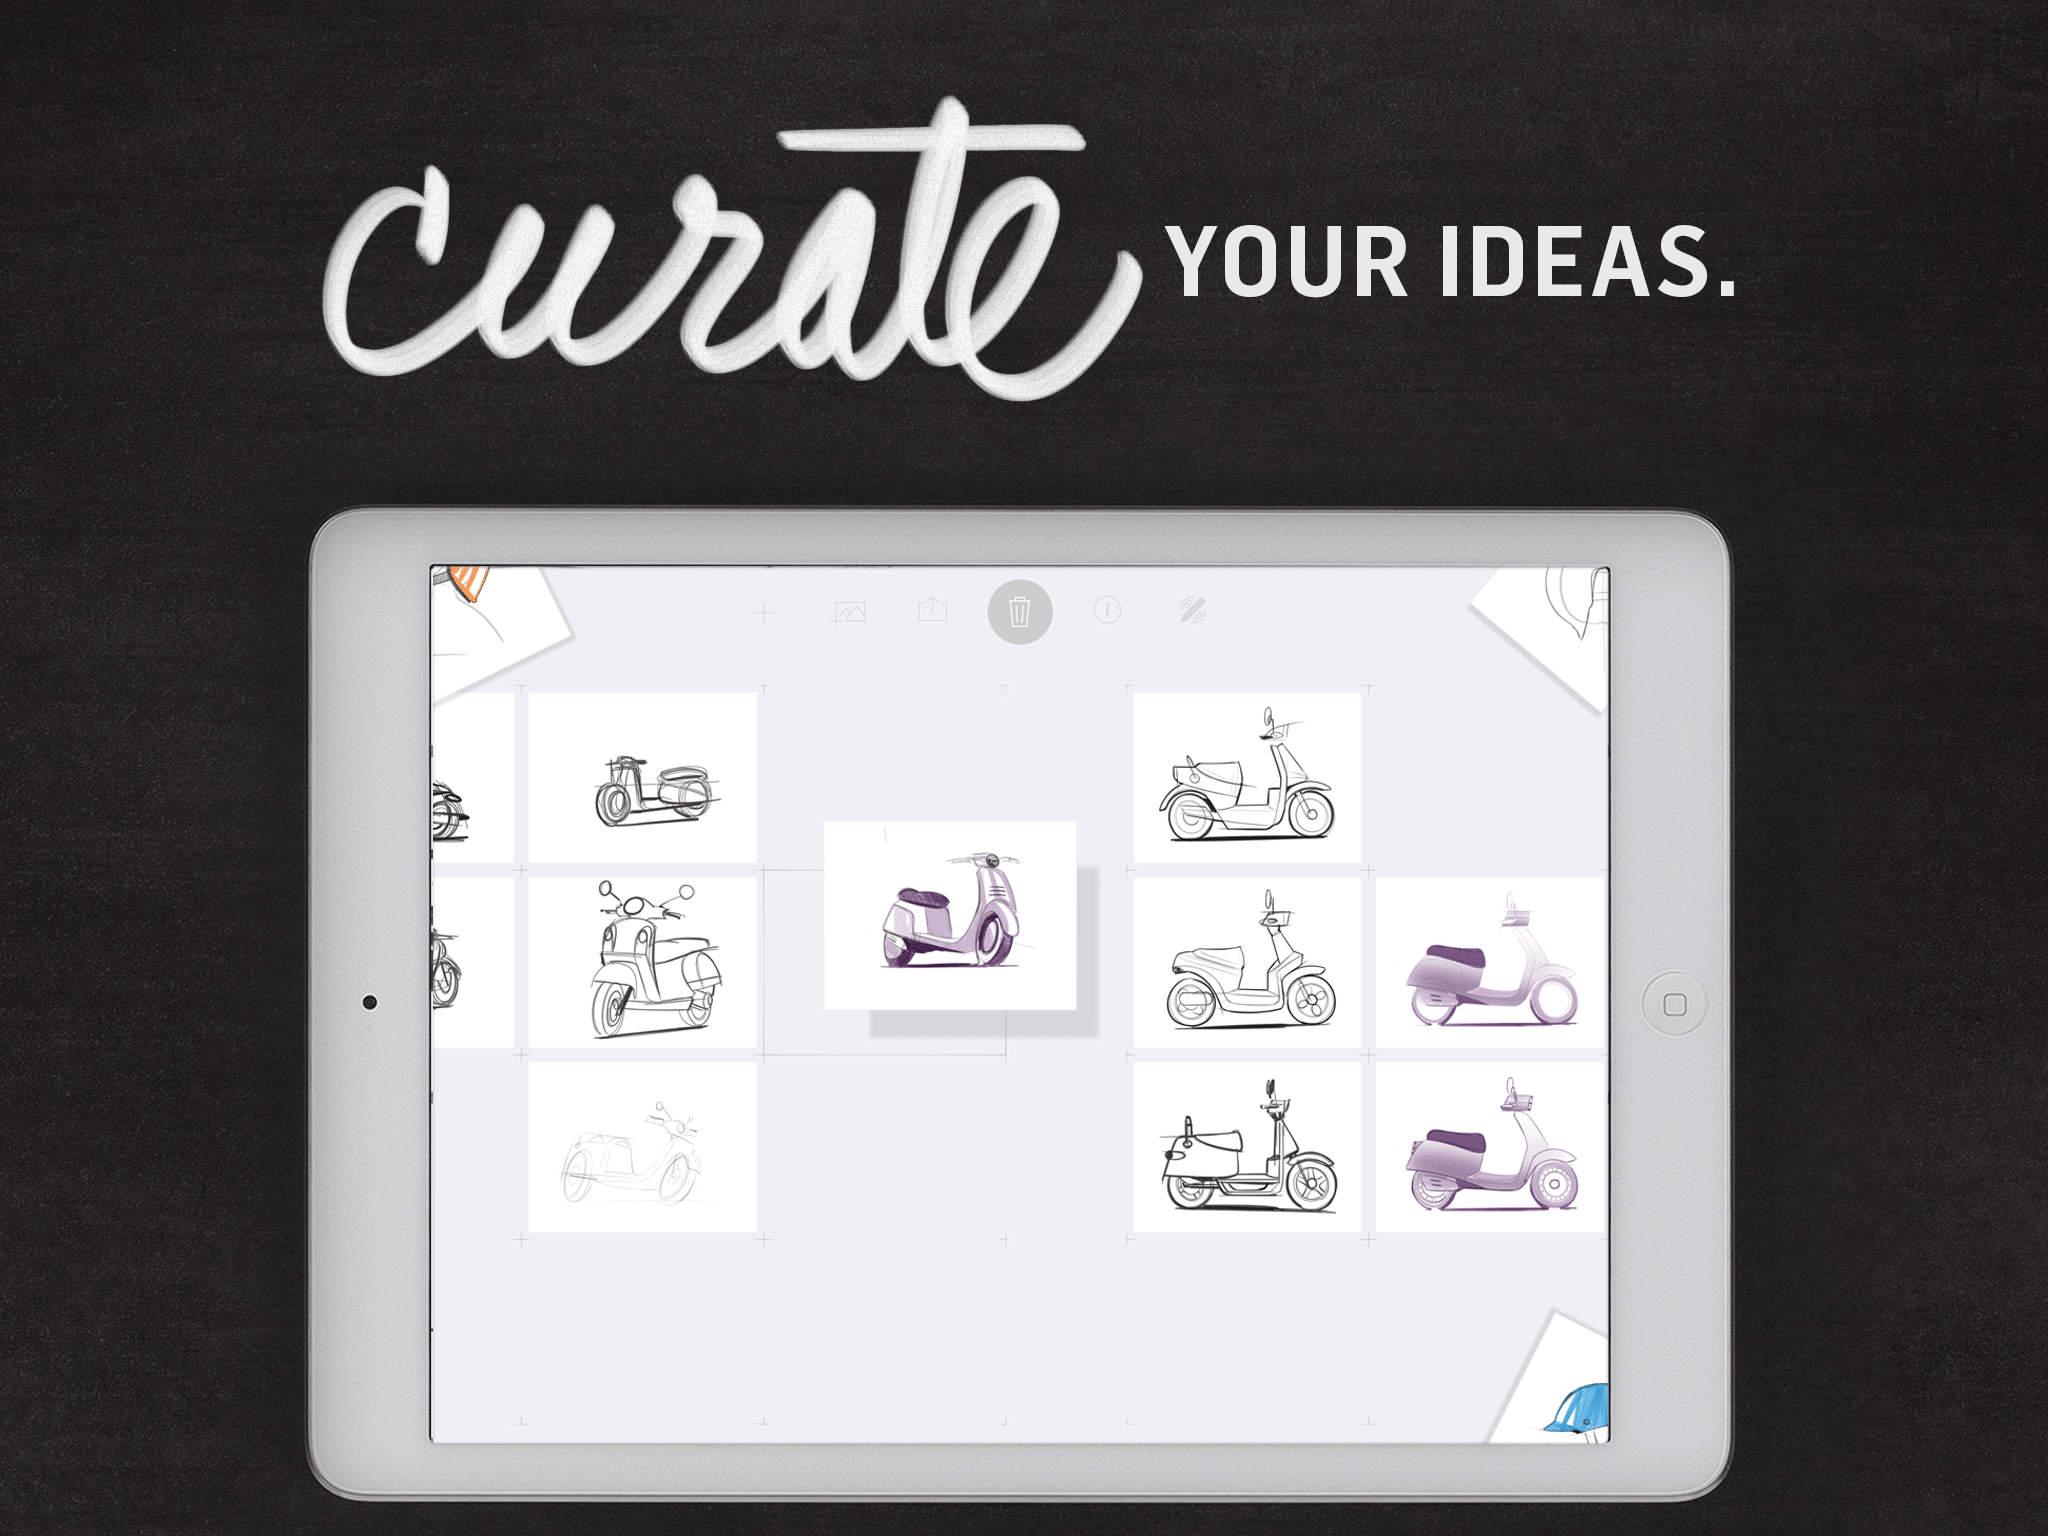 Forge - Build Your Ideas: Brainstorm. Sketch. Organize. screenshot-3